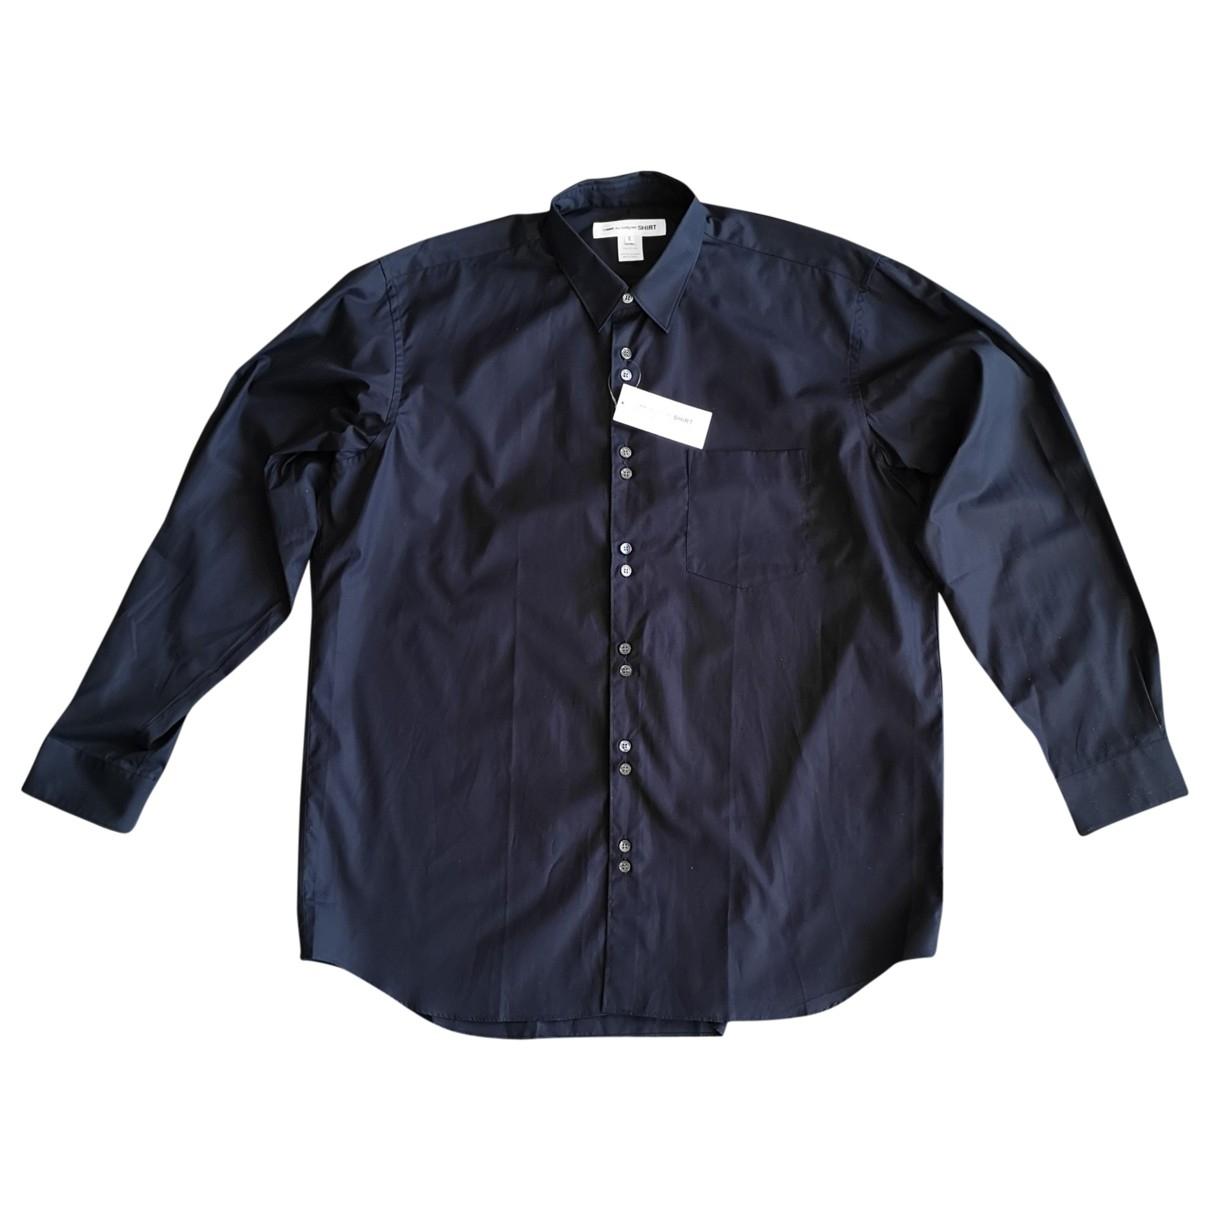 Comme Des Garcons \N Navy Cotton Shirts for Men XL International